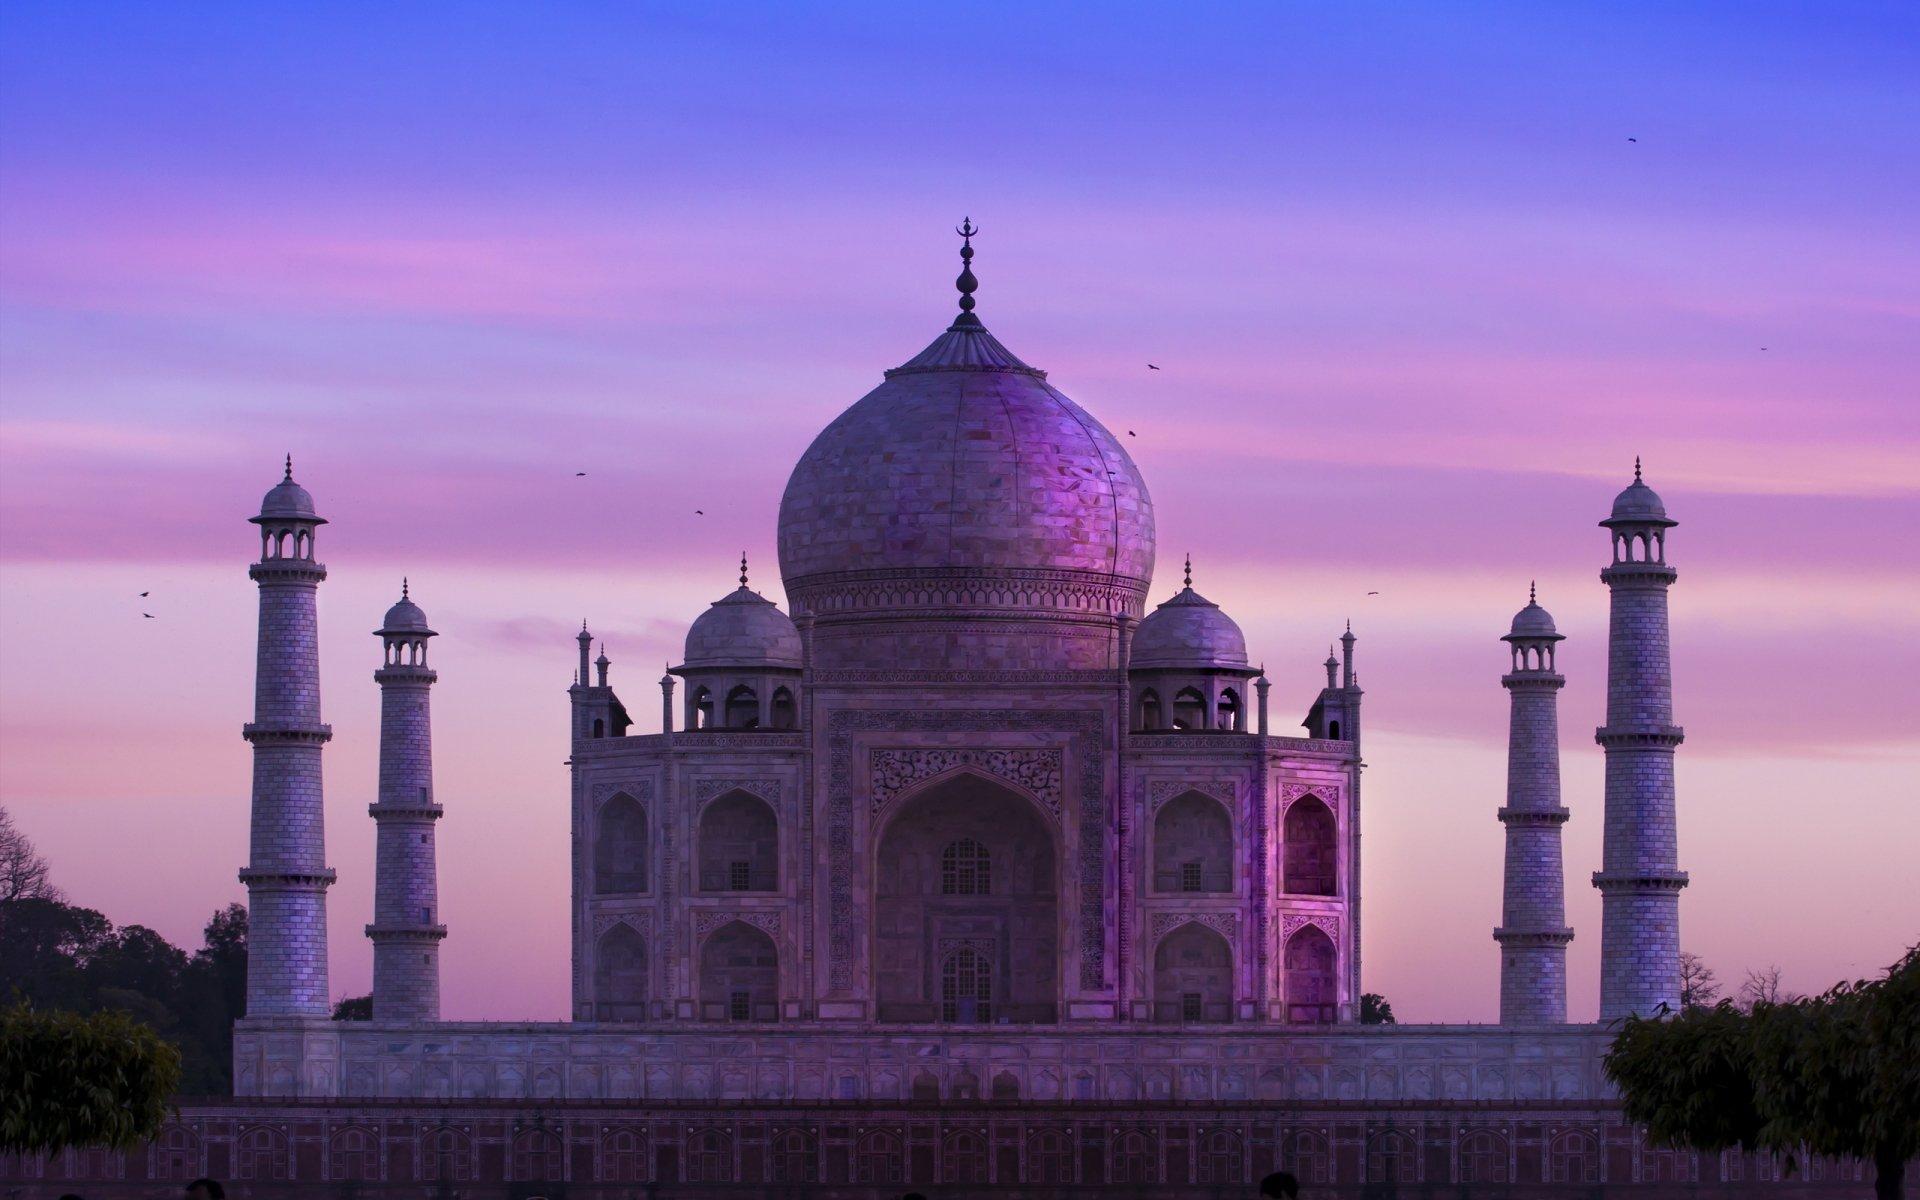 Taj mahal full hd wallpaper and background image - Taj mahal background hd ...